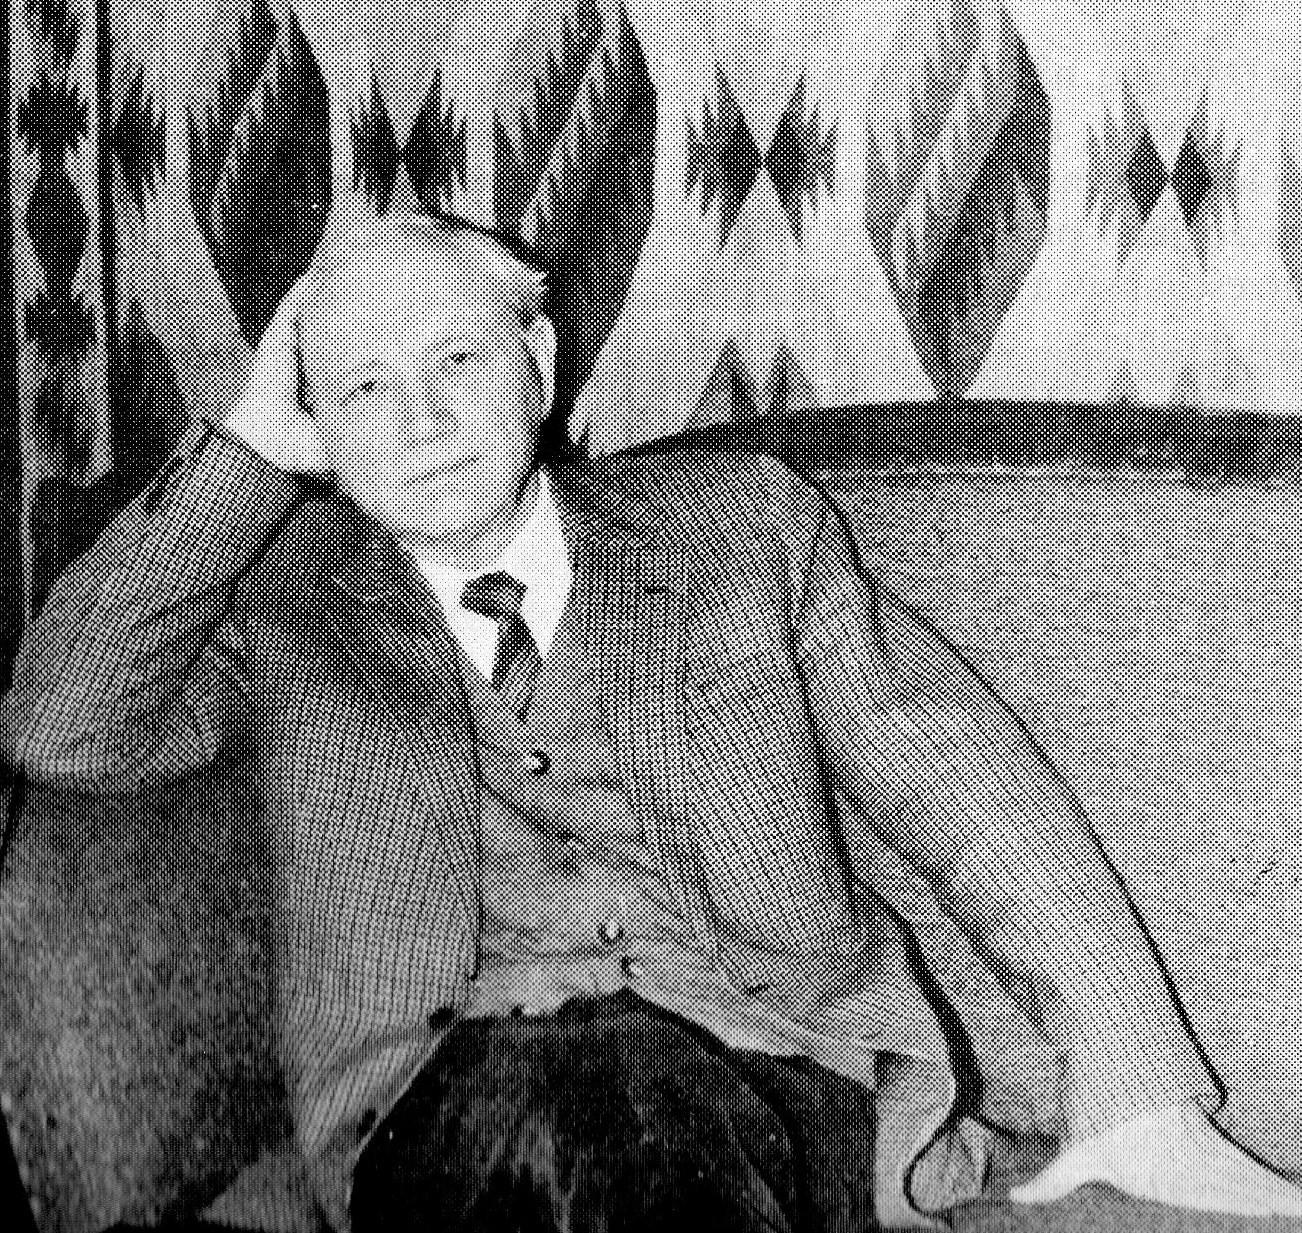 Jan Białostocki 1988